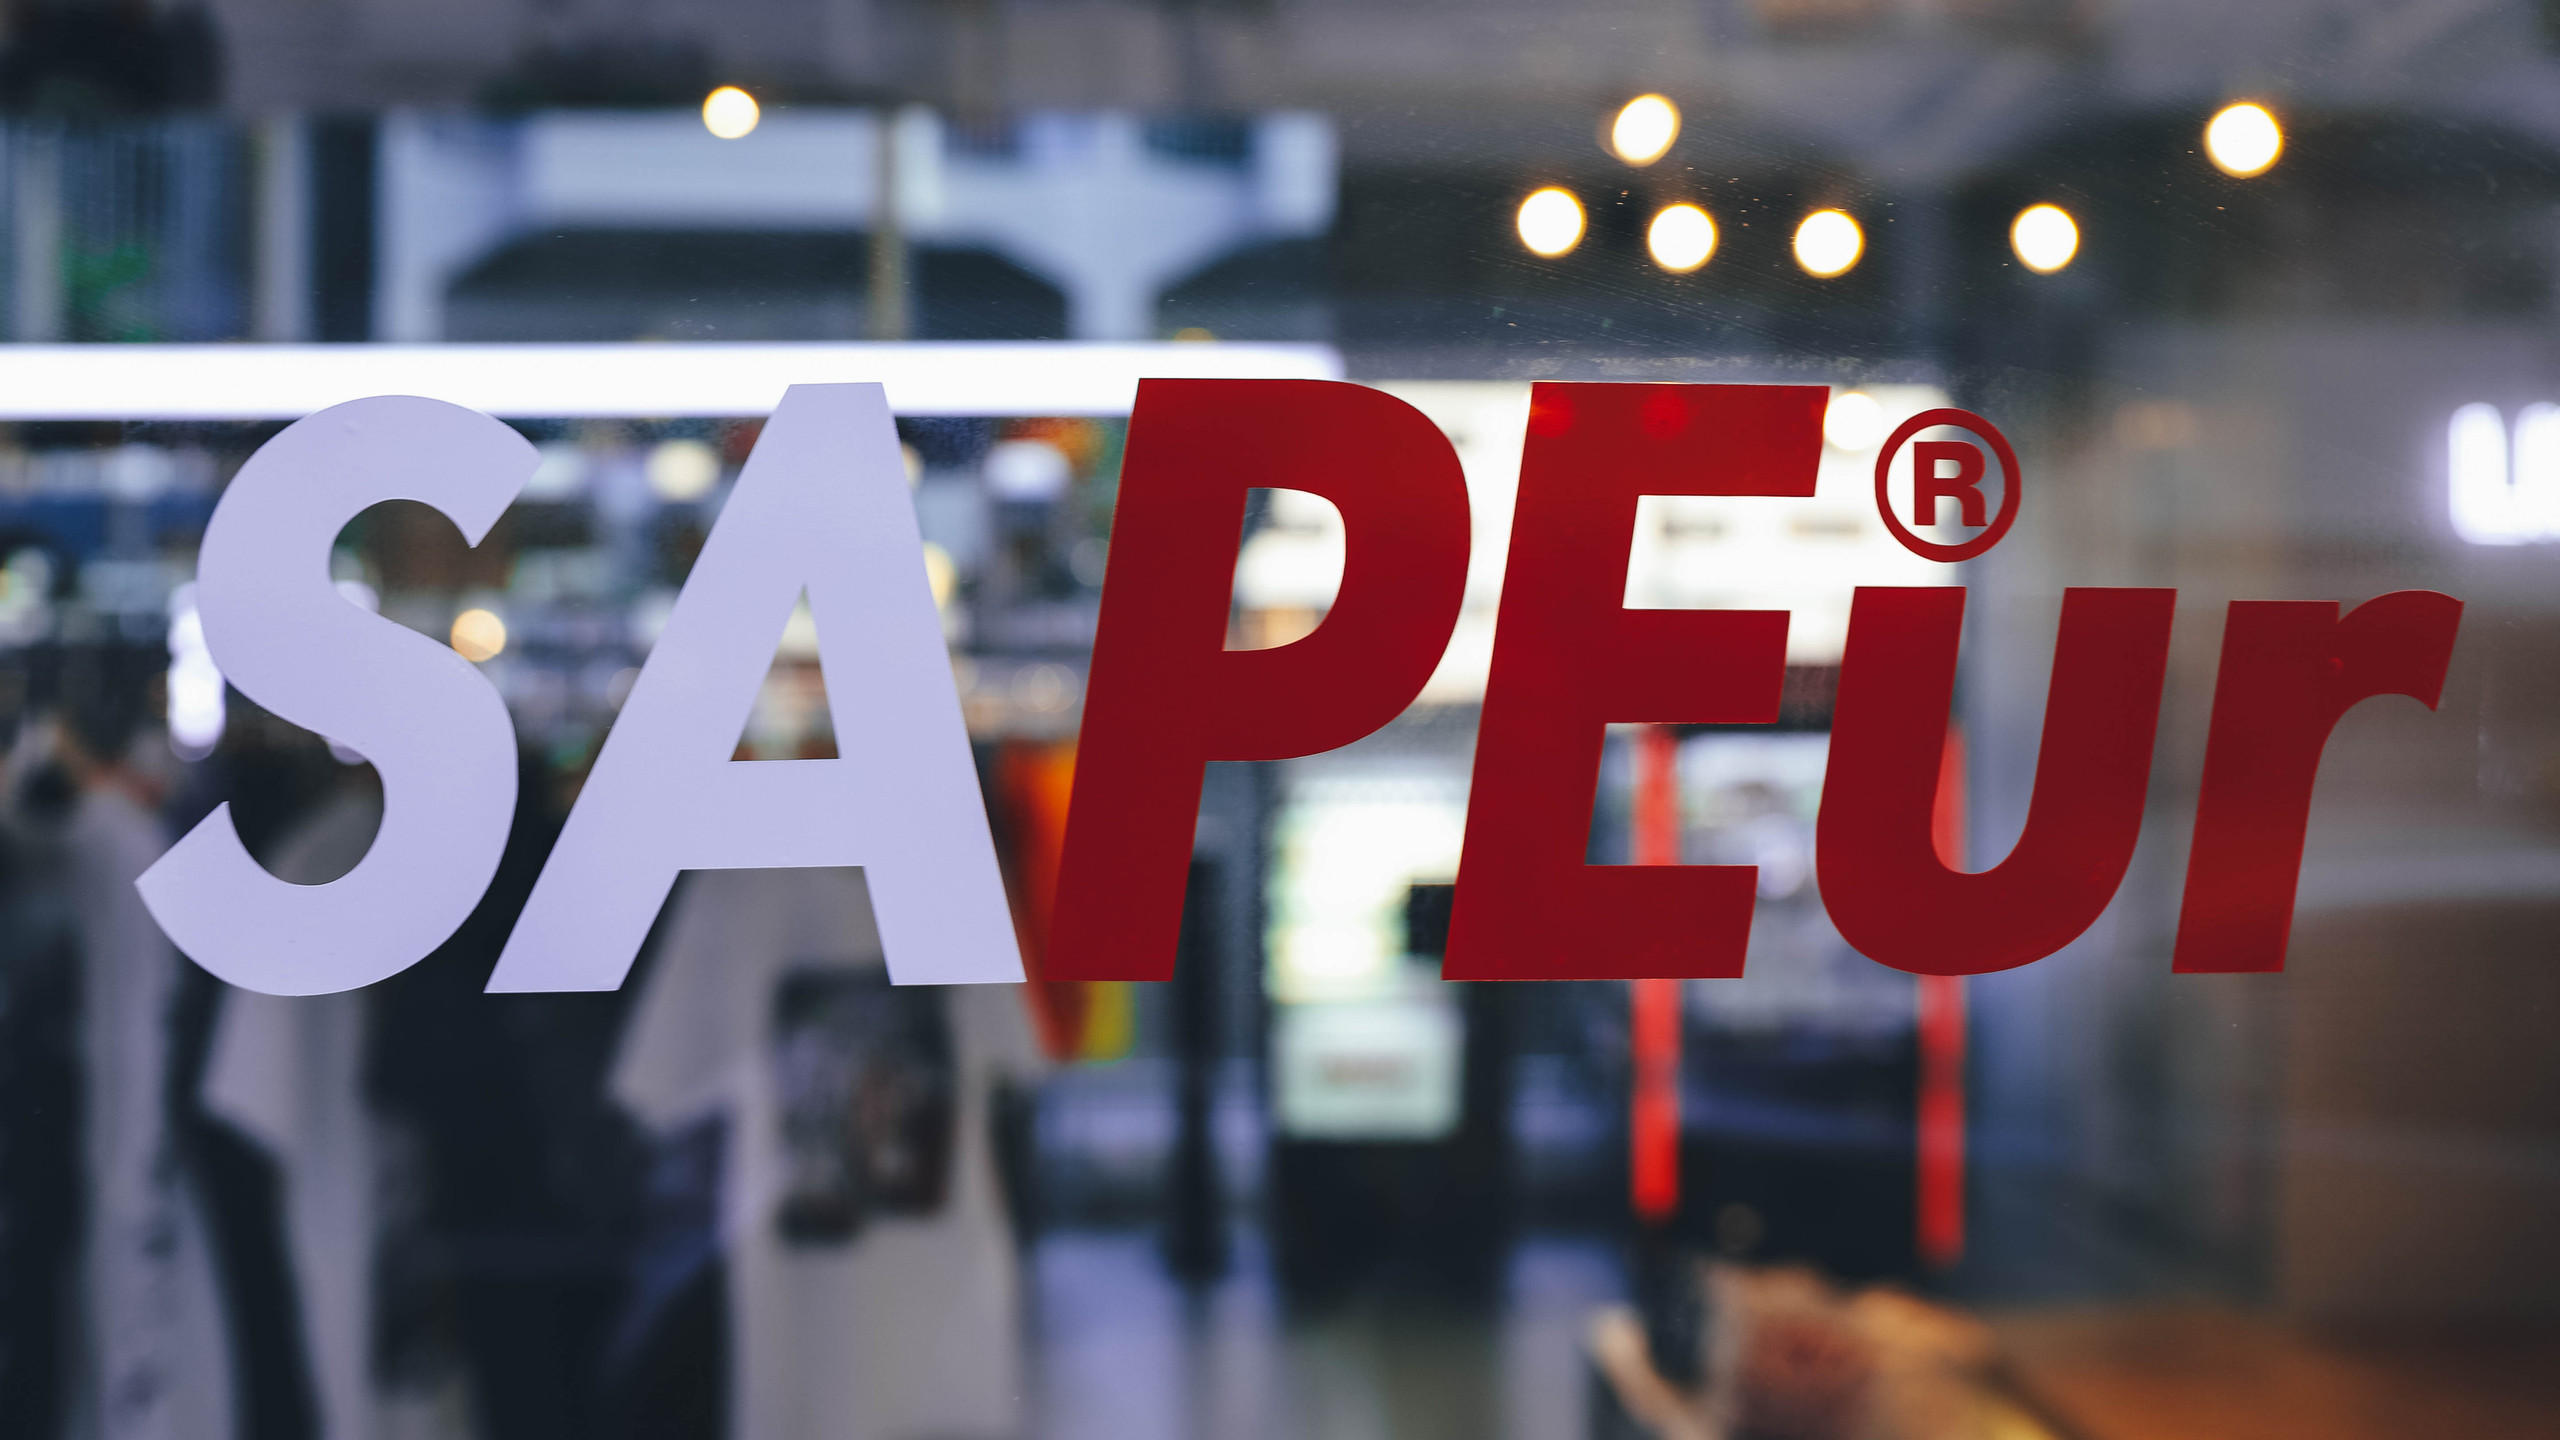 SAPEur,サプール,popupstore,lineupstore,